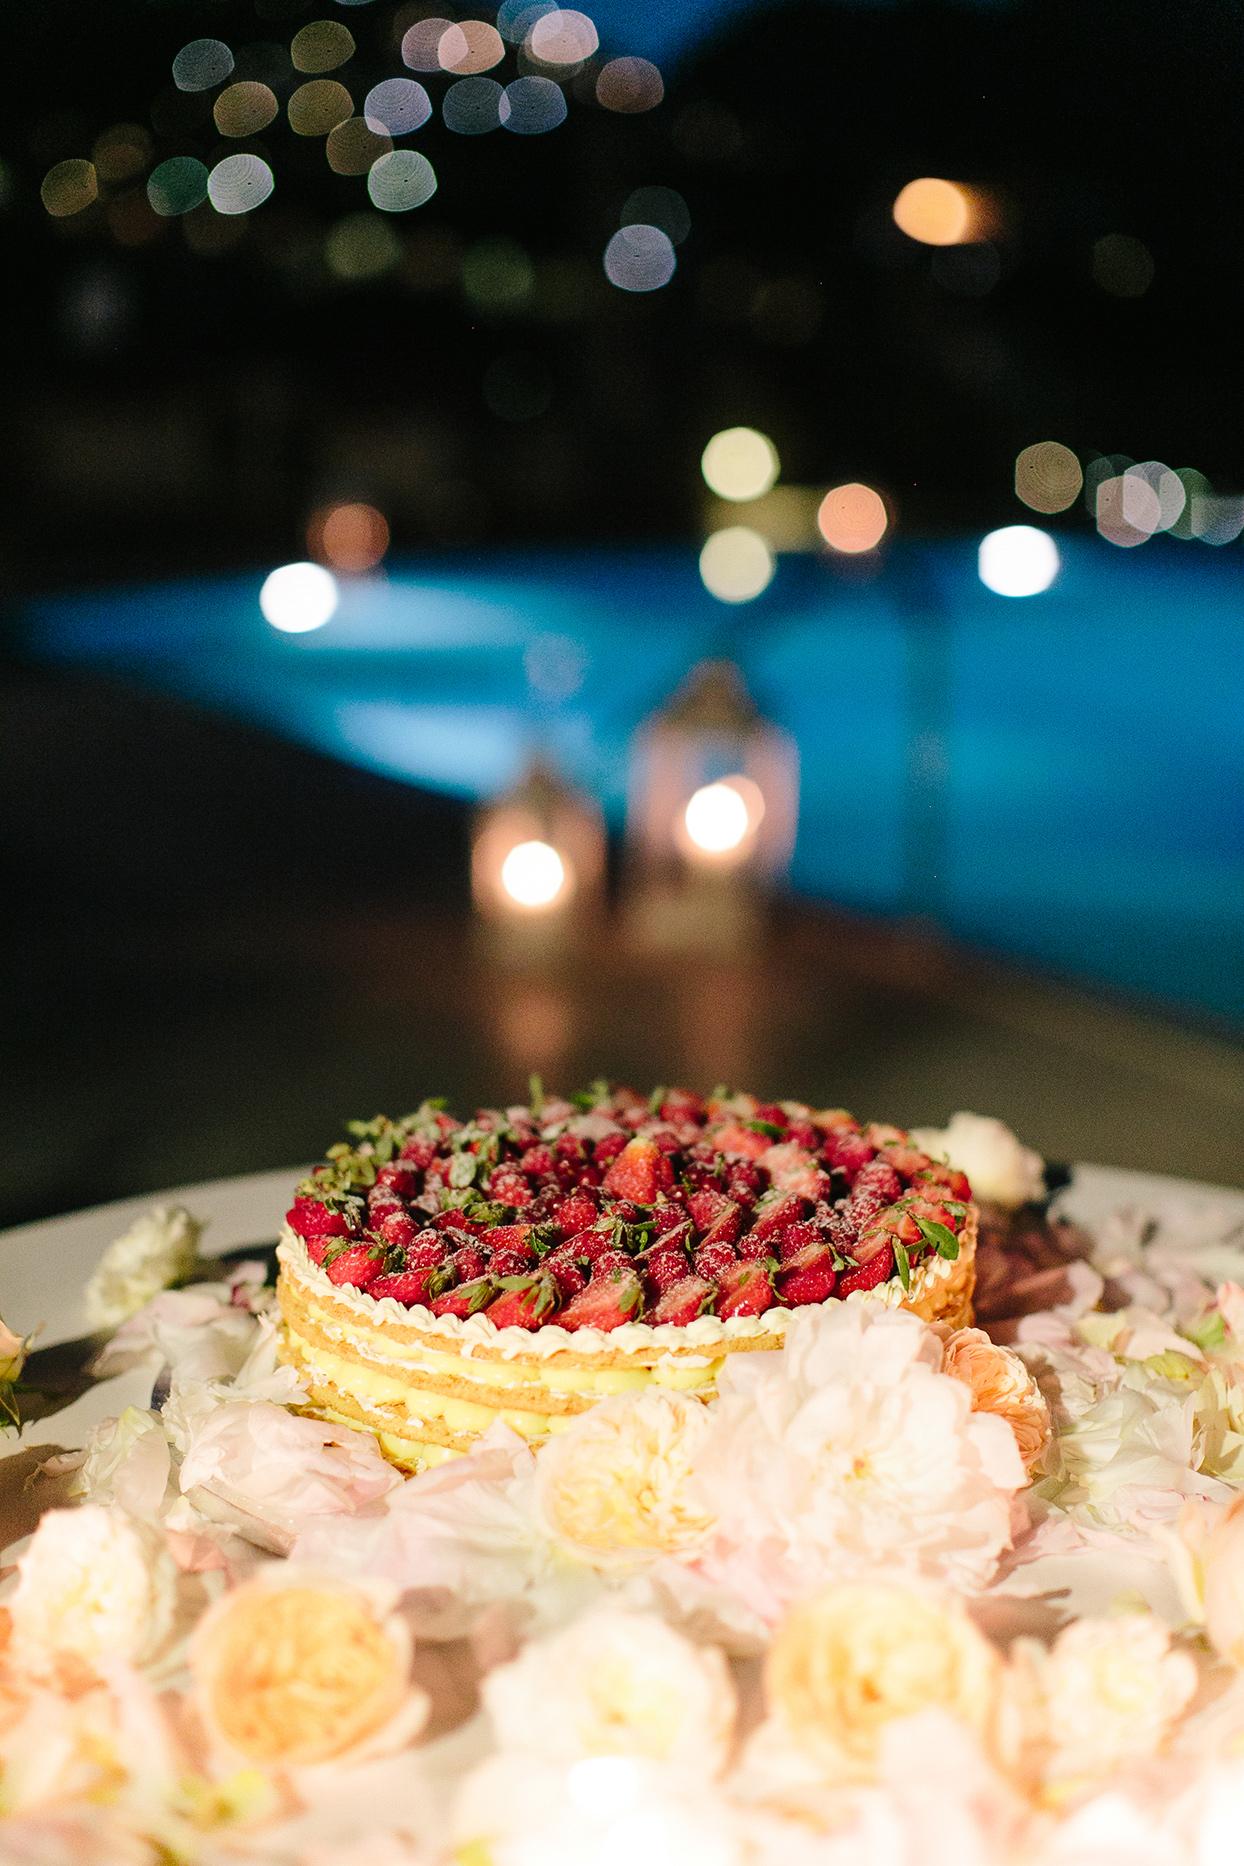 jacqueline david wedding cake covered in strawberries